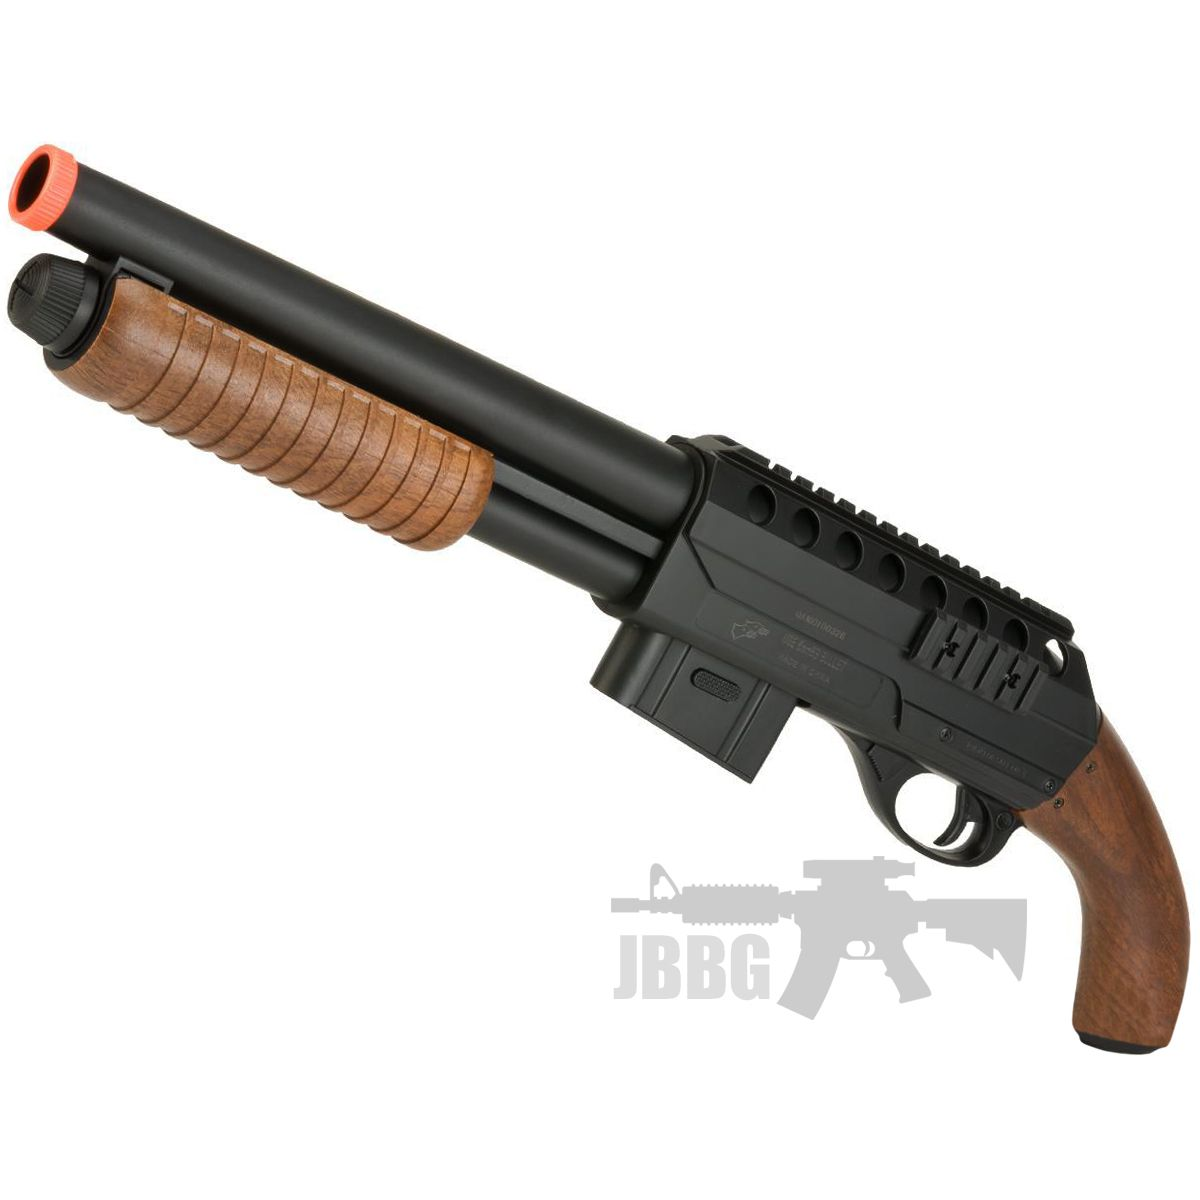 M47C1 Pump Action Spring Powered Airsoft Shotgun